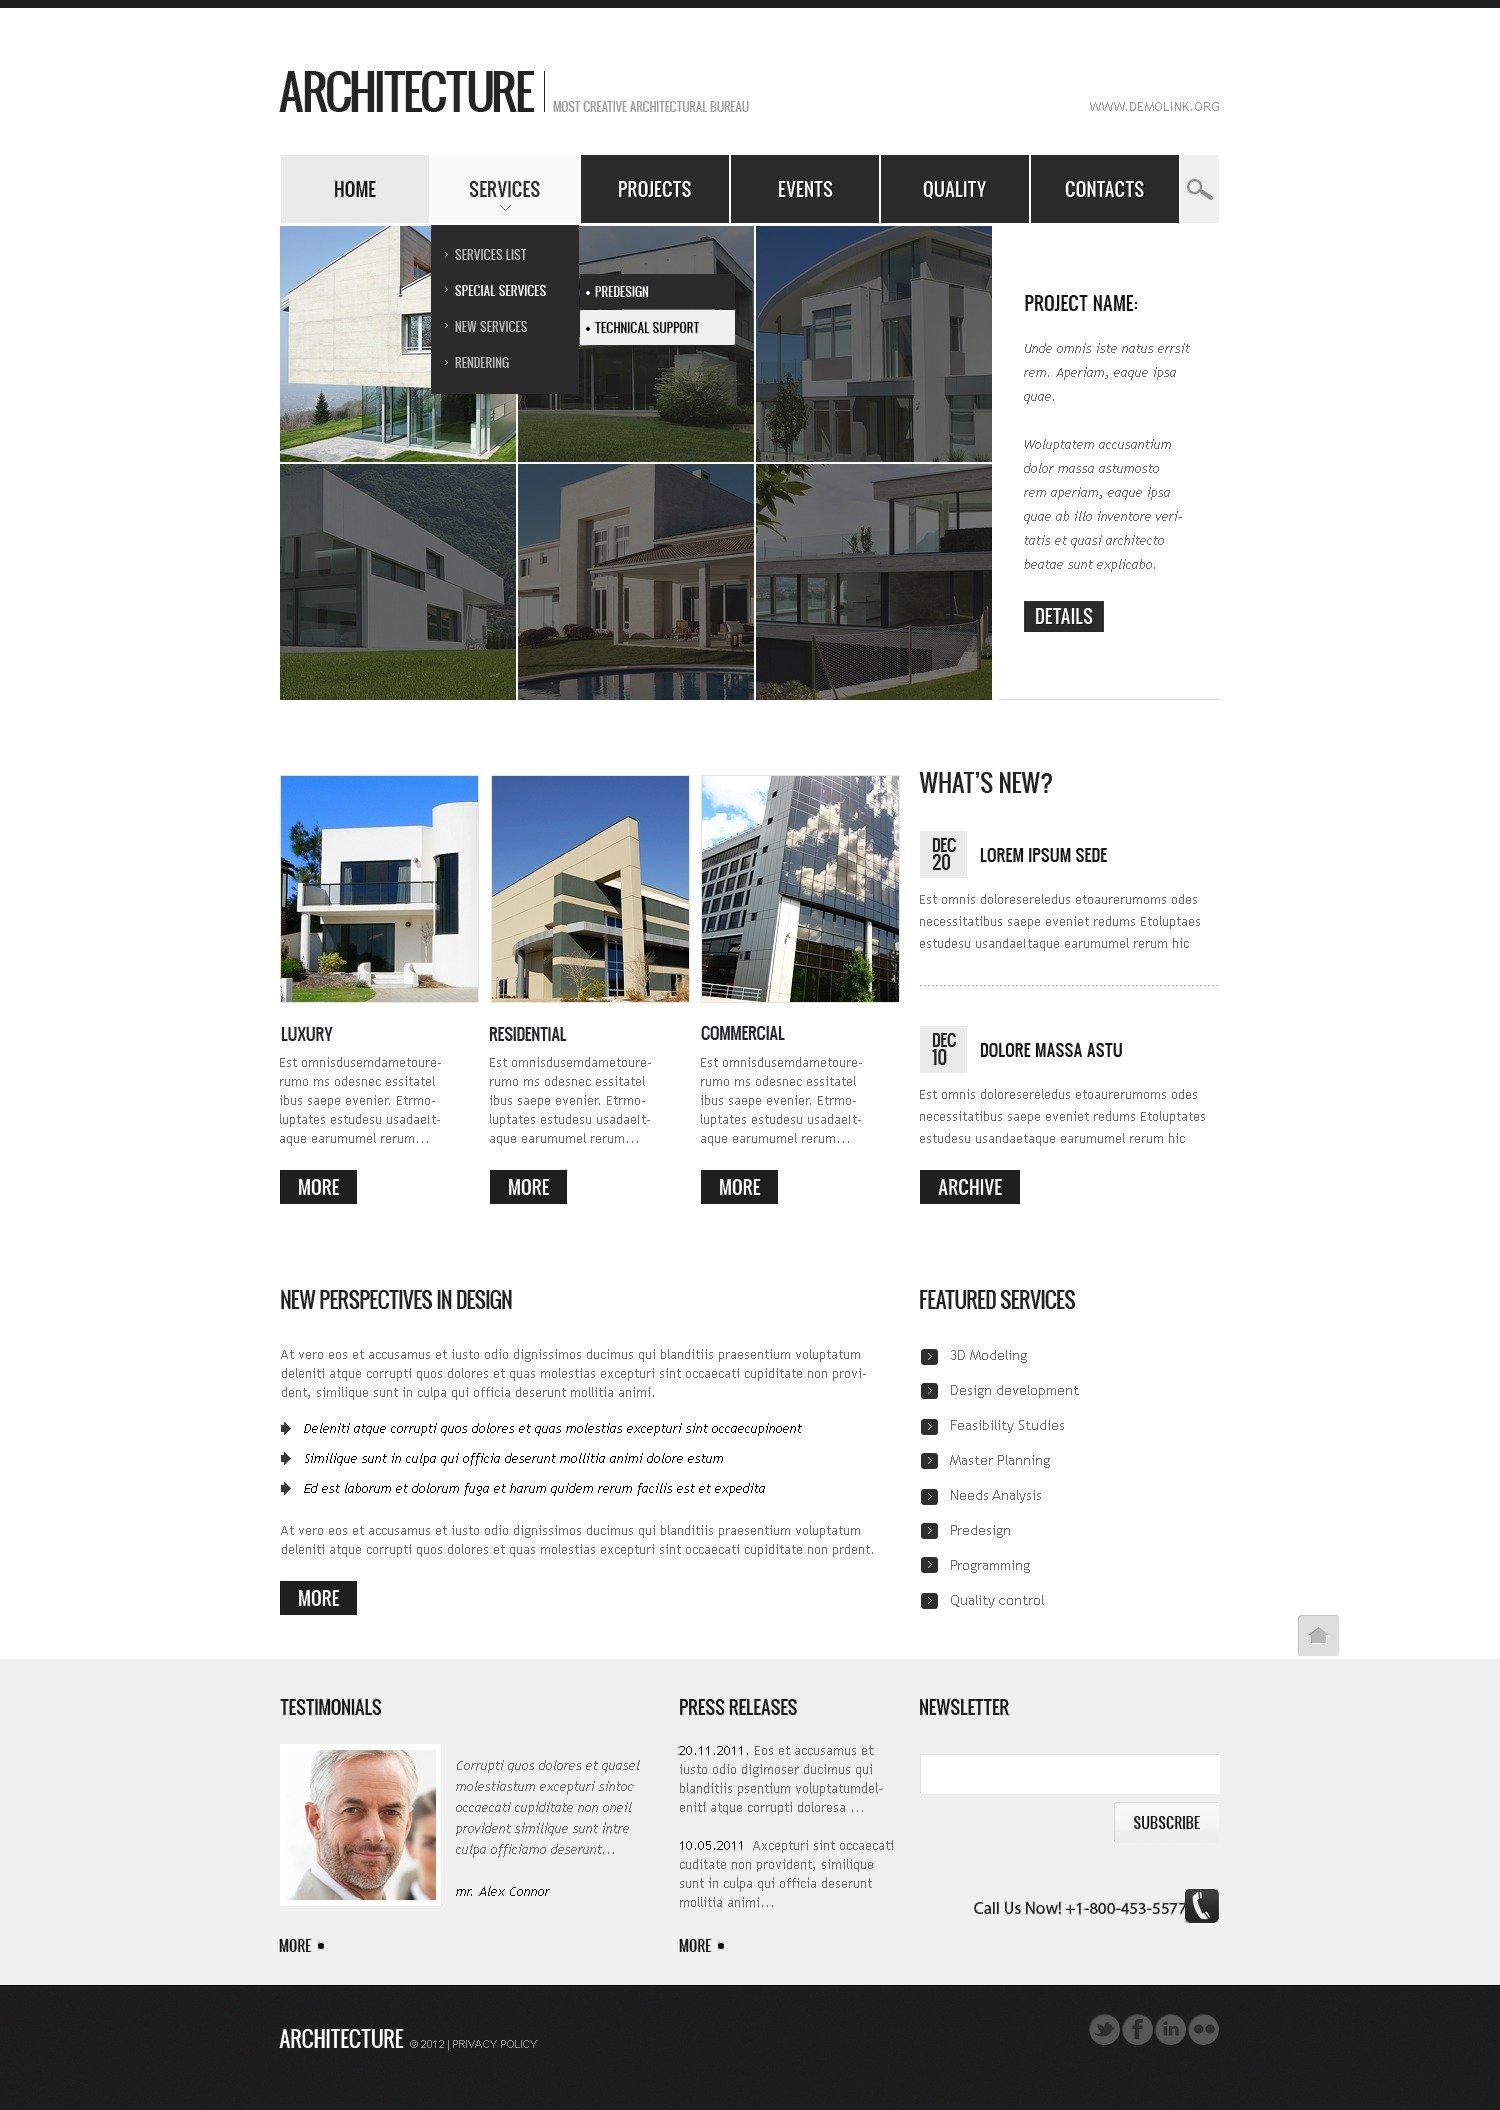 Architecture Drupal Template - screenshot